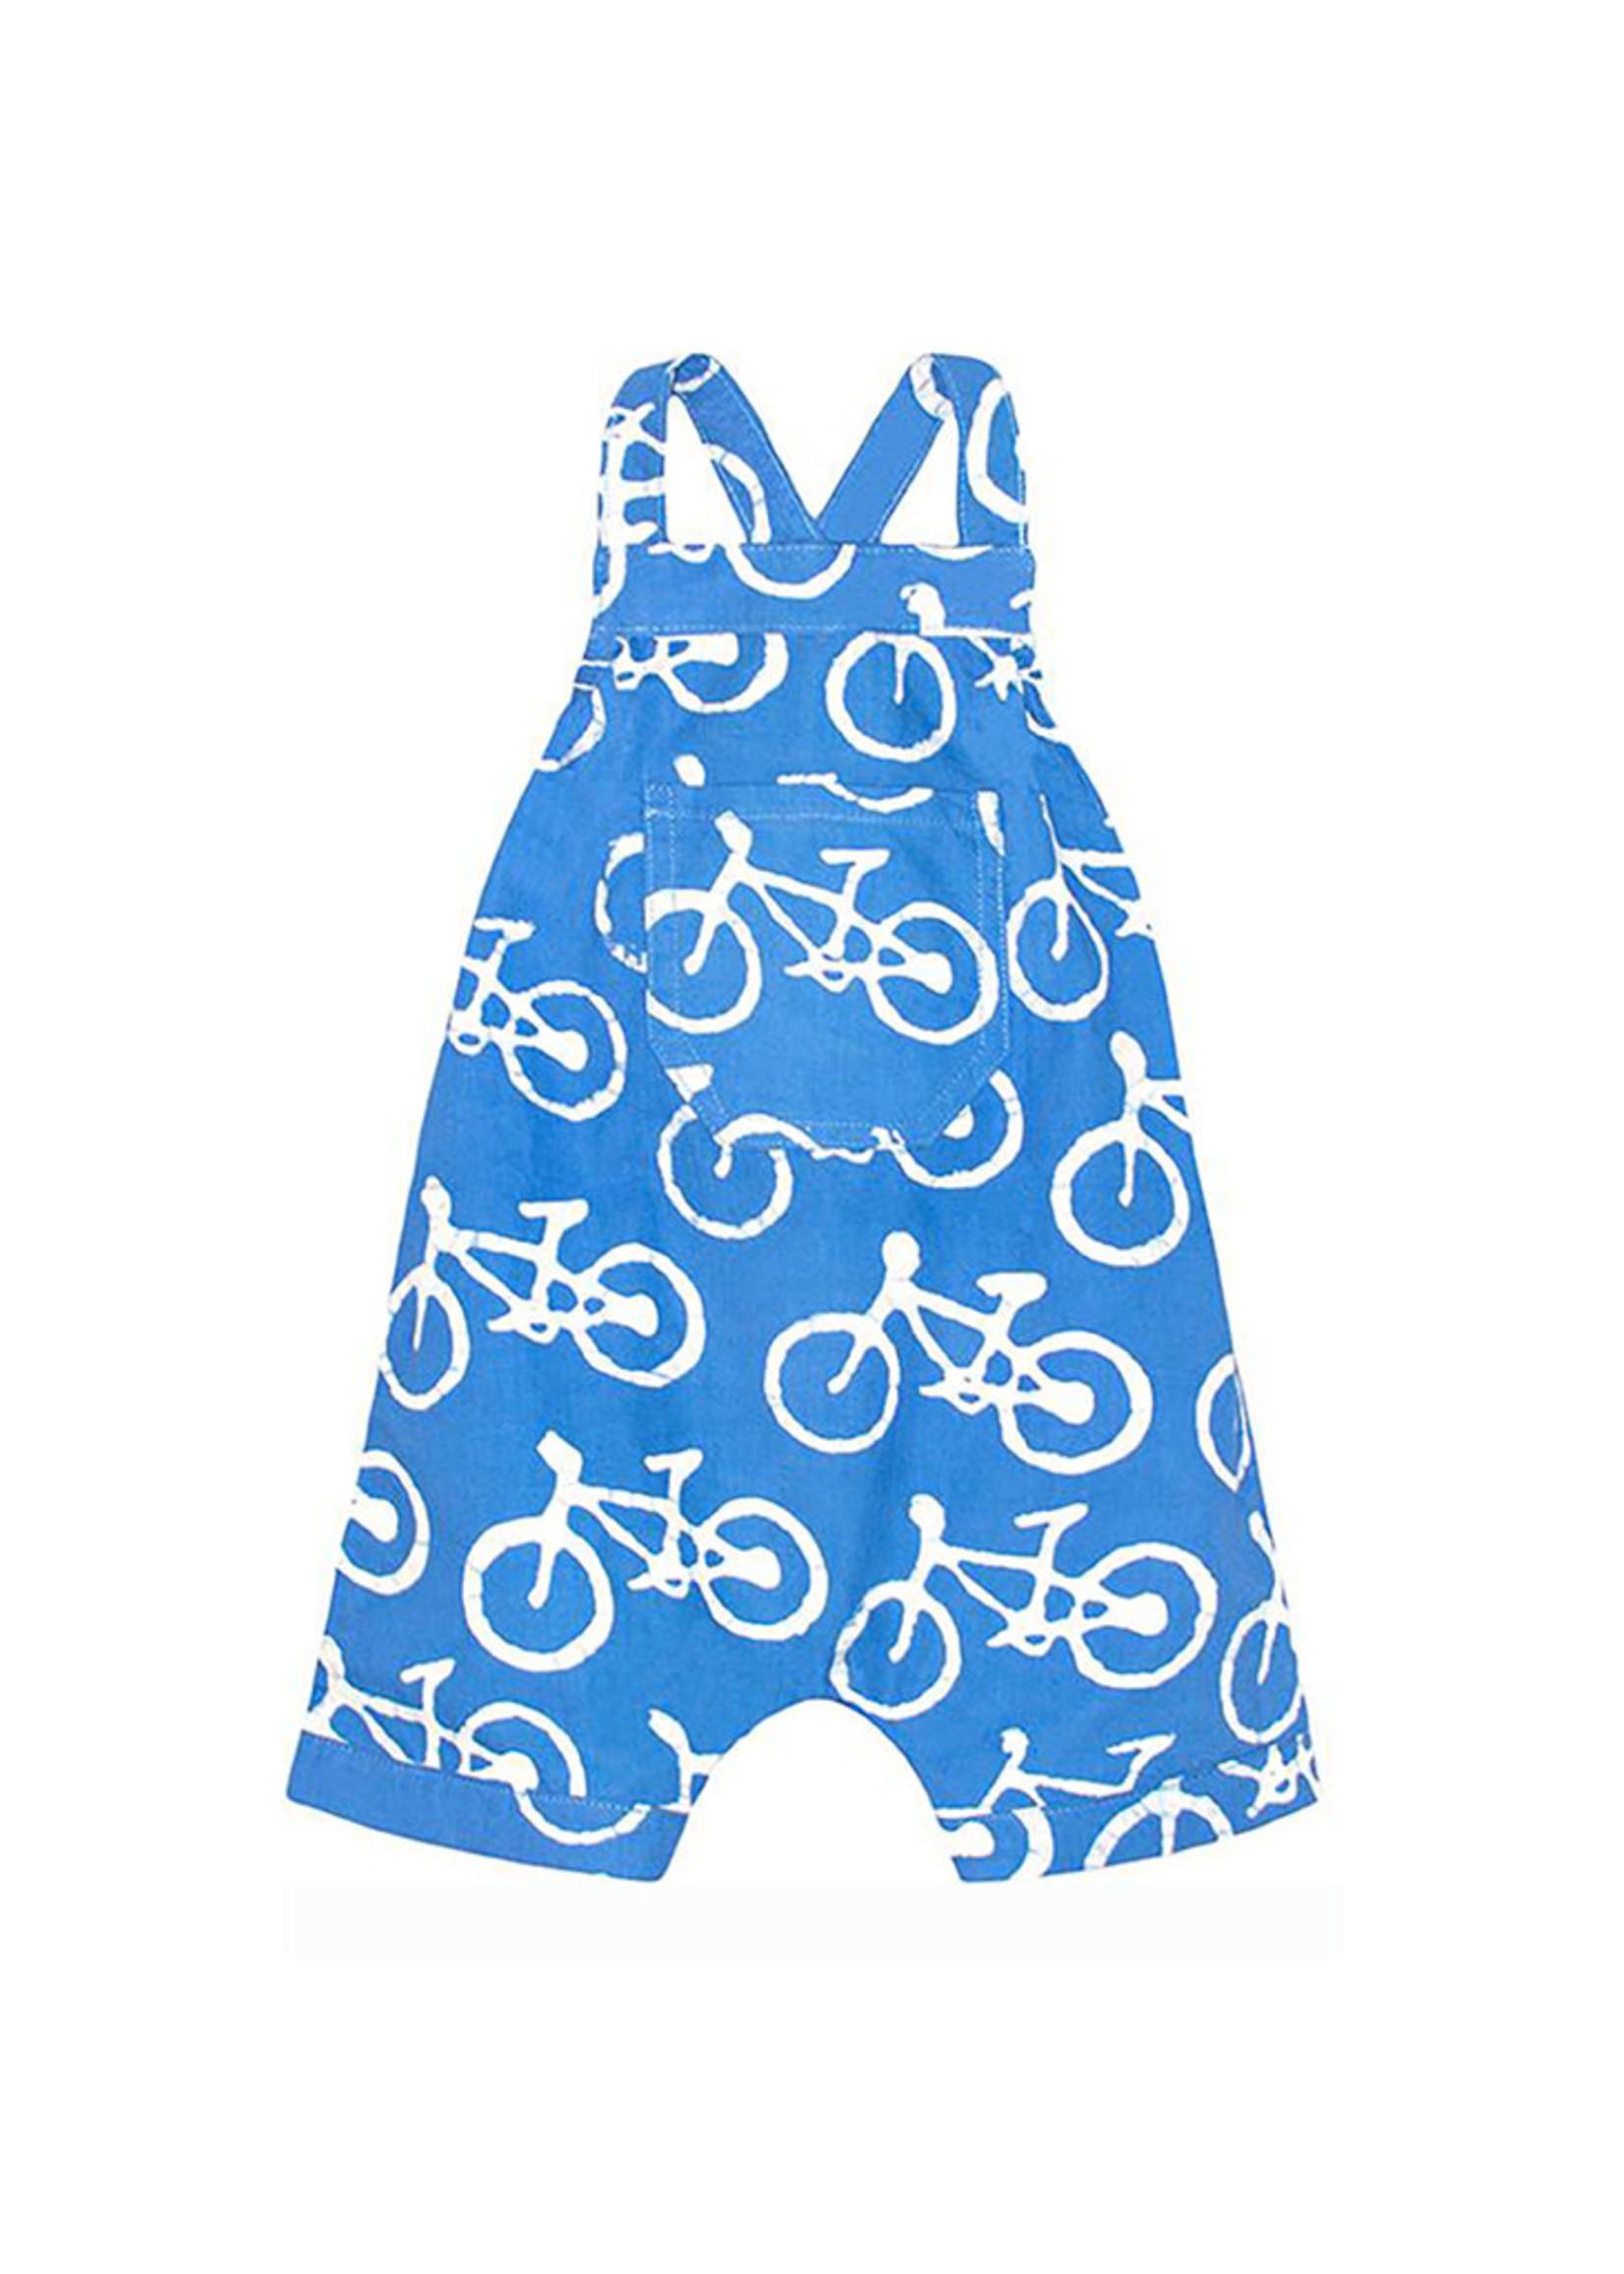 Global Mamas Blue Bikes Baby Romper